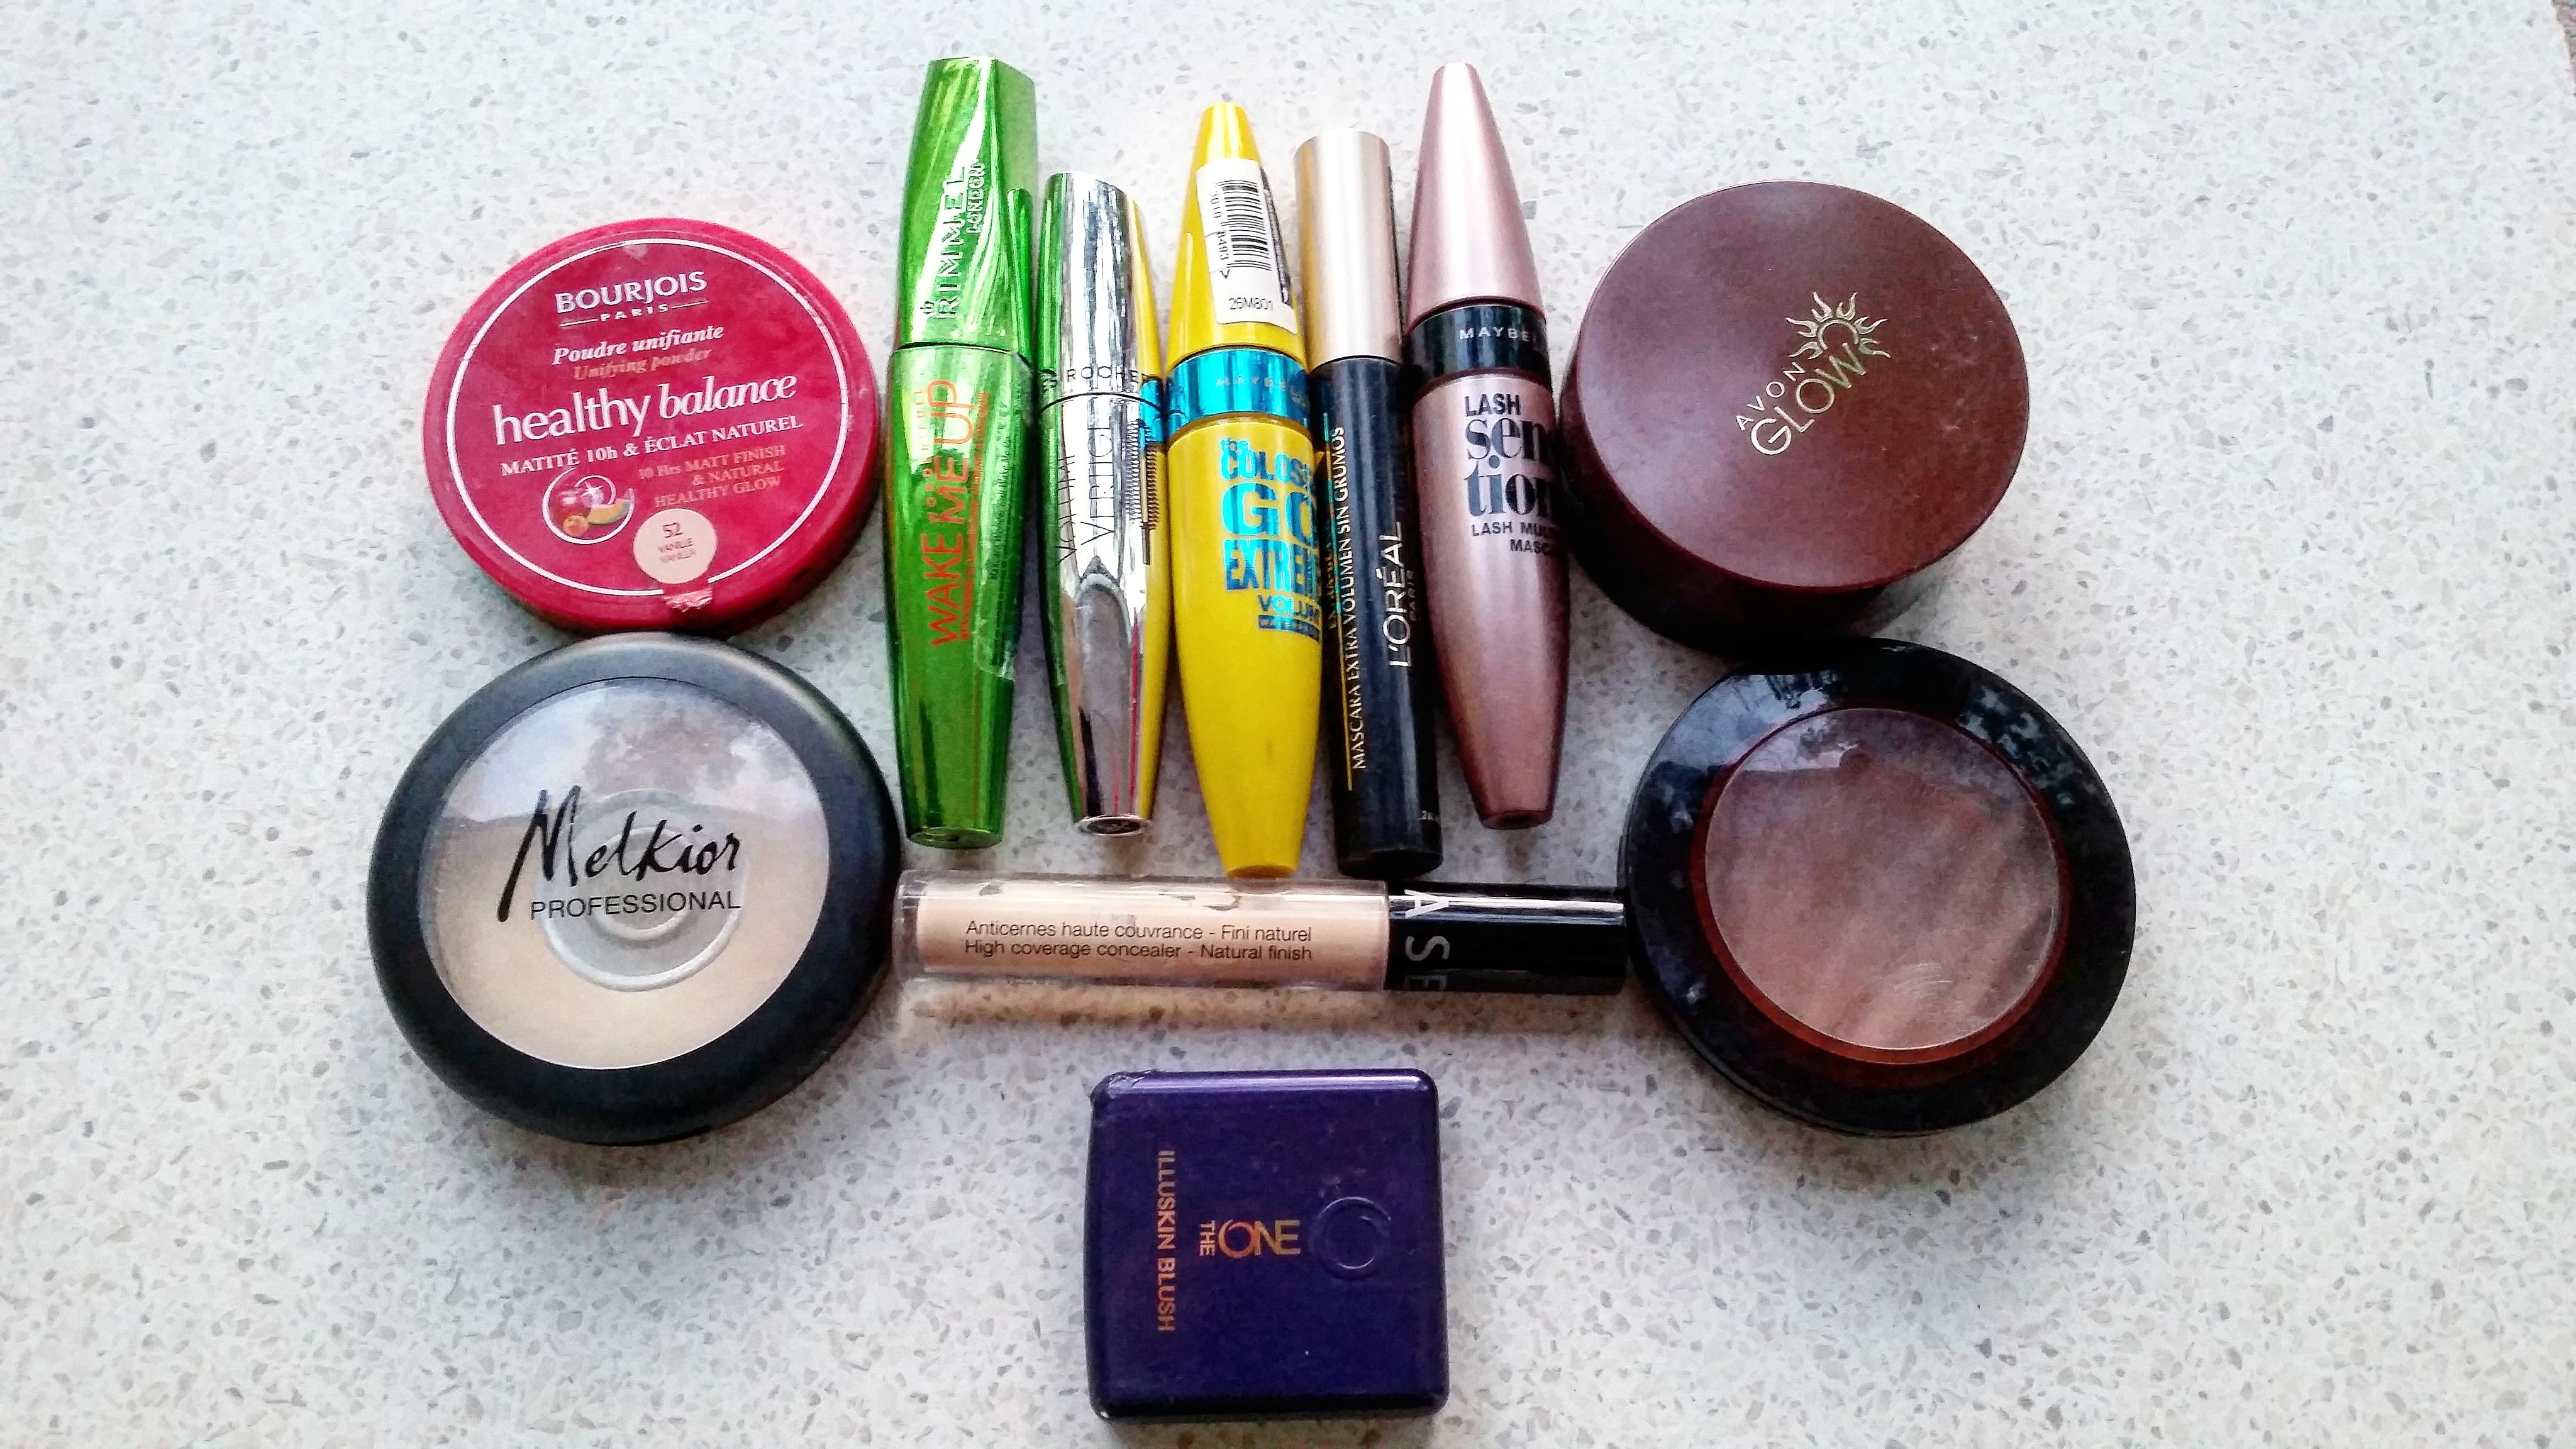 make-up empties september 2016 maybelline sephora rimmel london avon oriflame bourjois melkior l'oreal beautyandatwist